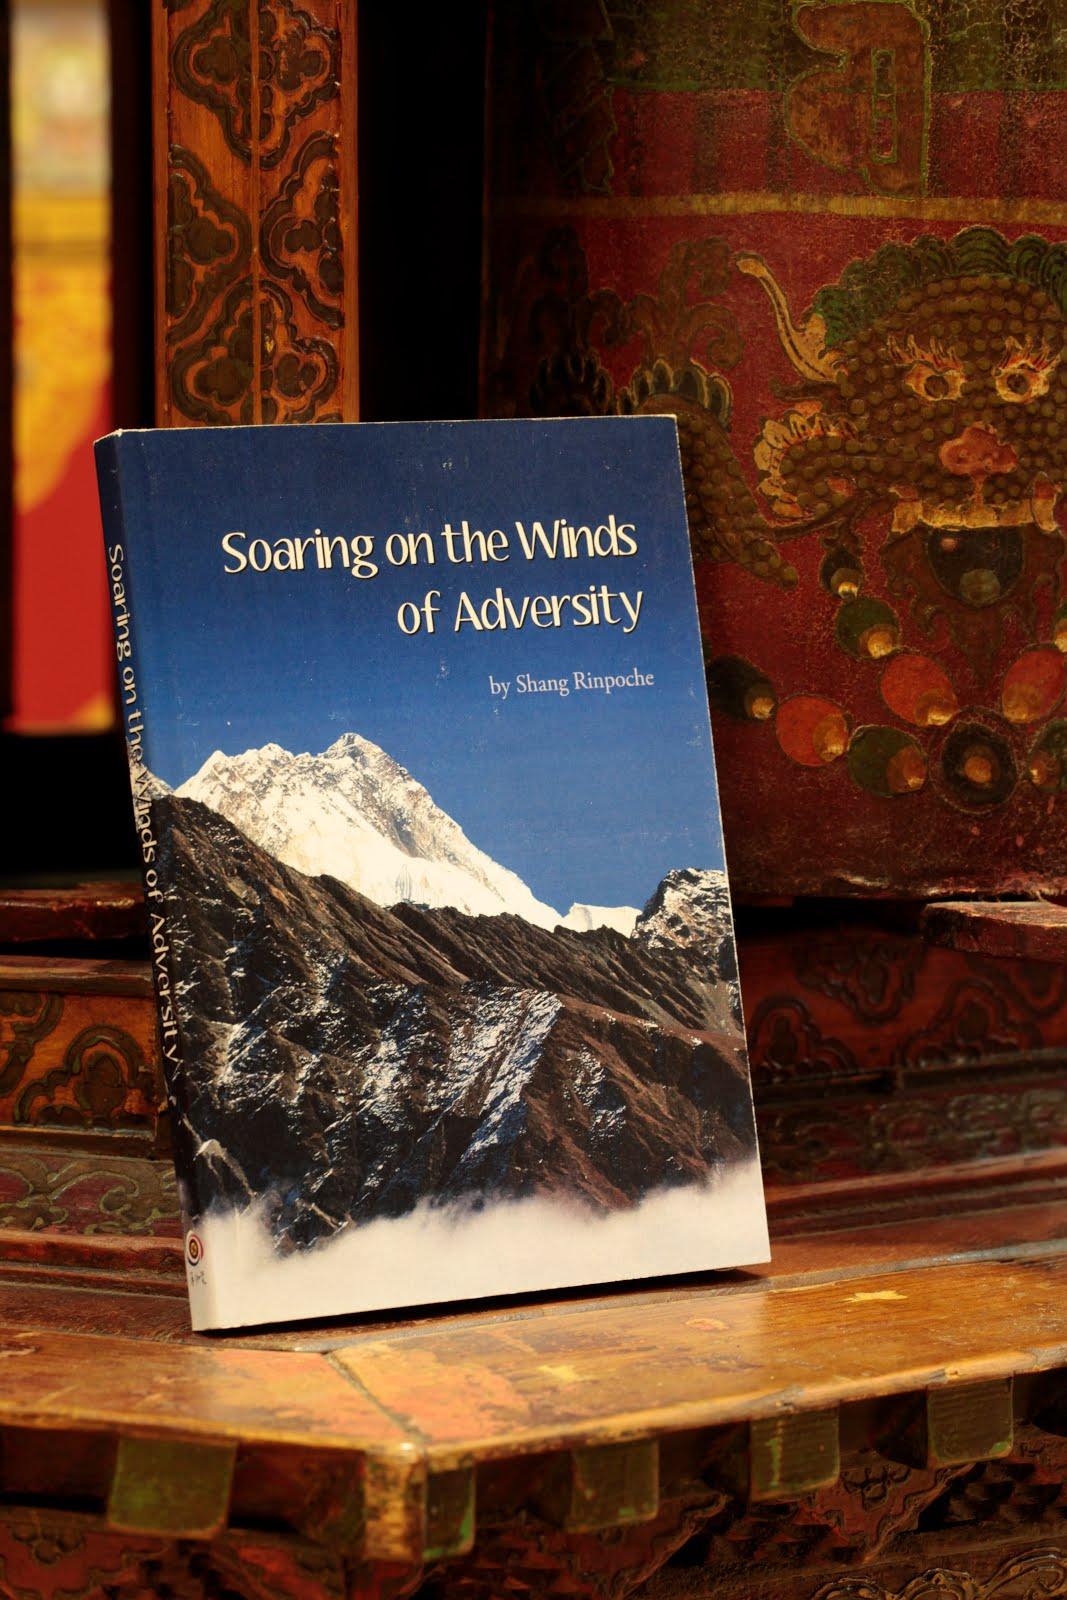 Soaring on the Winds of Adversity Original.jpg